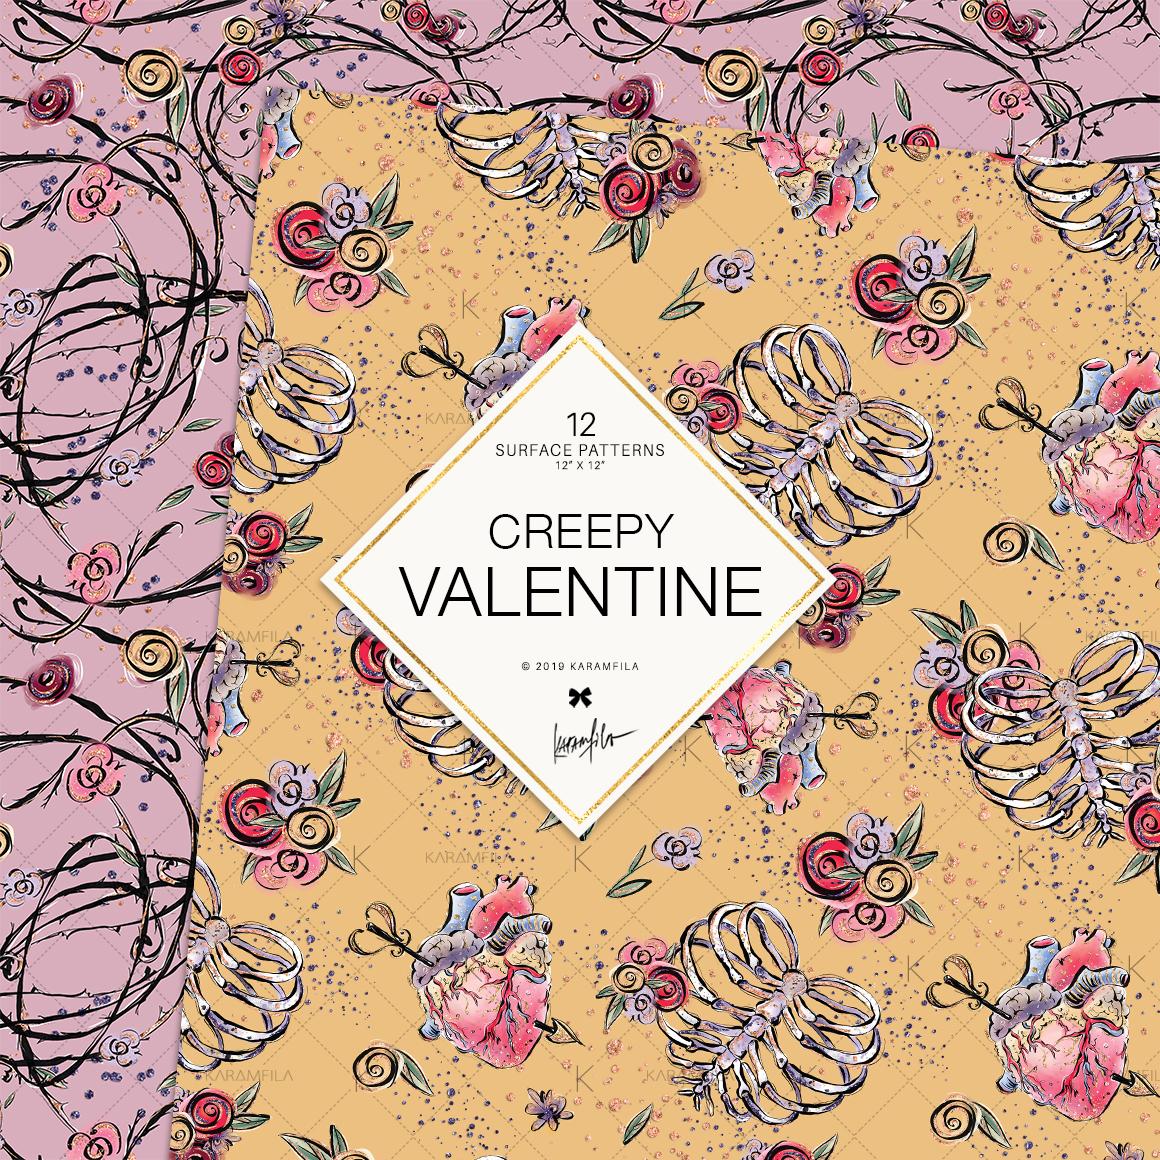 Creepy Valentine's Day Patterns example image 3